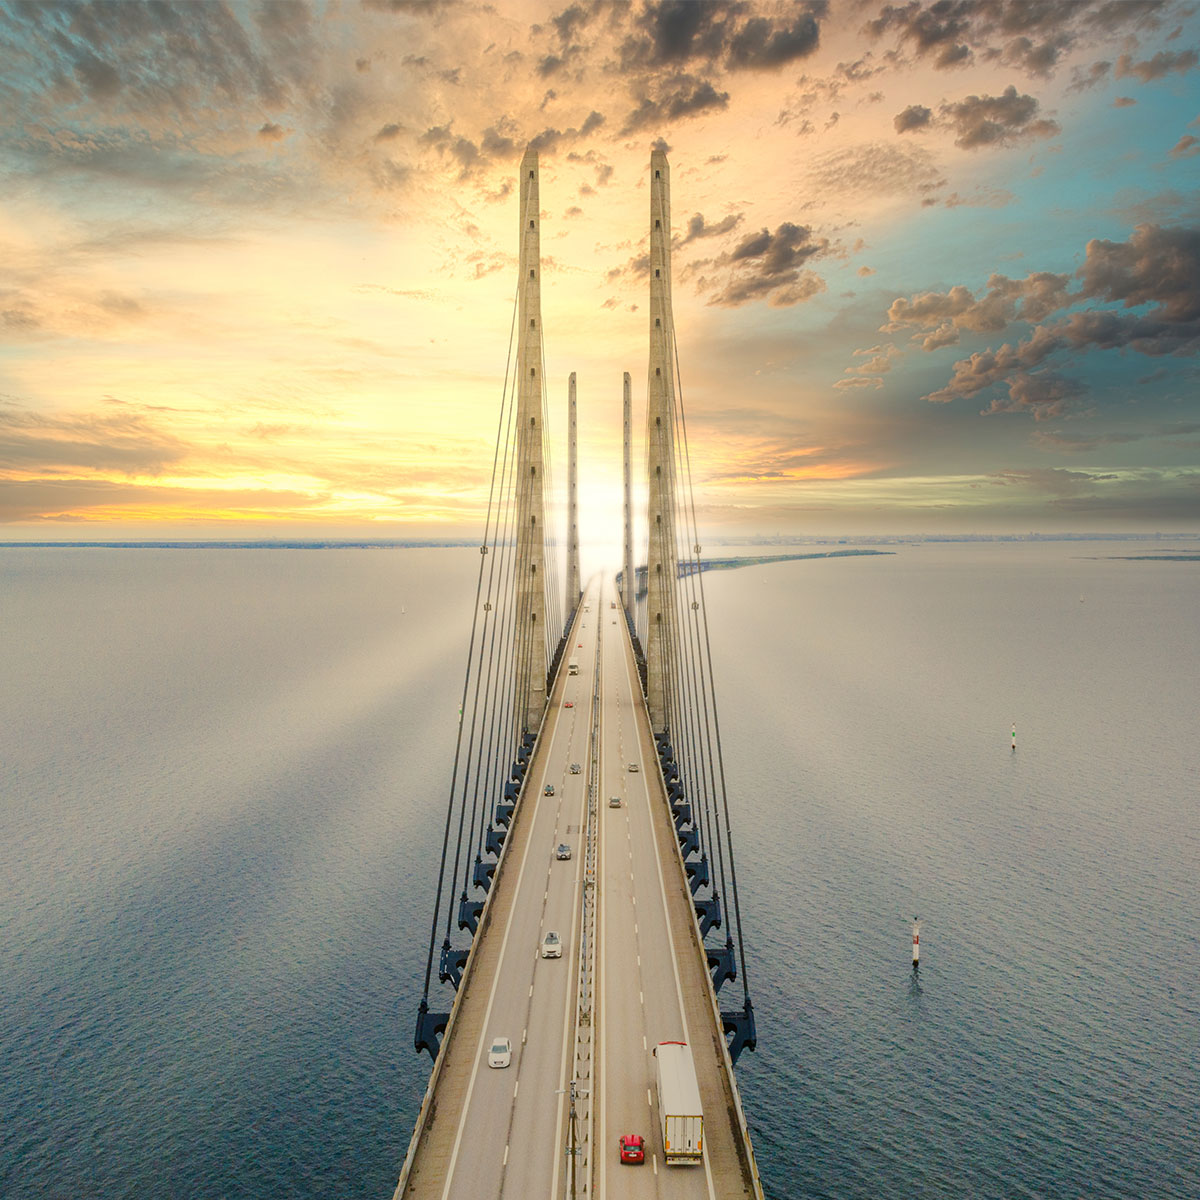 Oresundsbro bridge between Denmark and Sweden at sunset